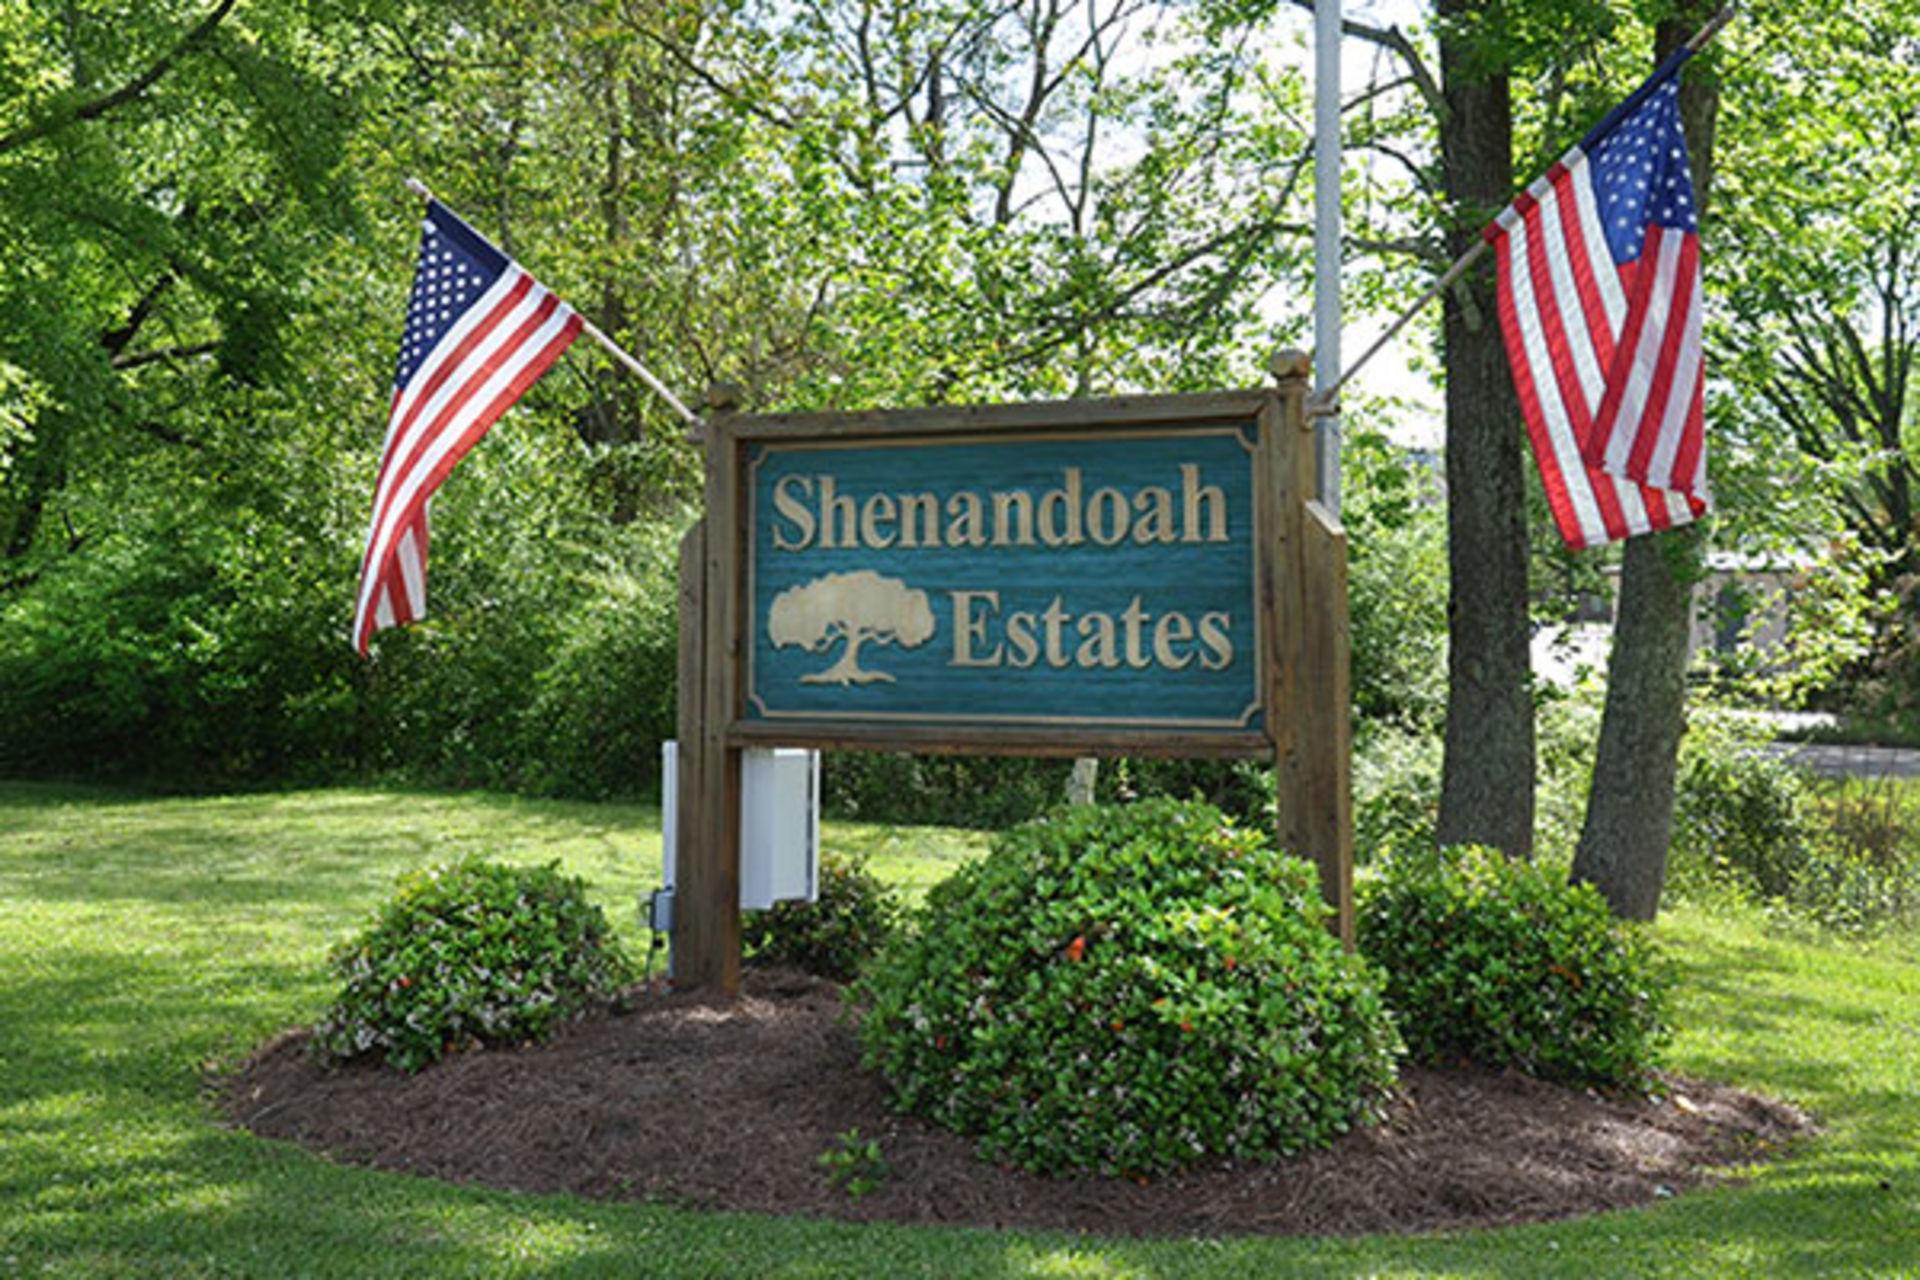 Shenandoah Estates